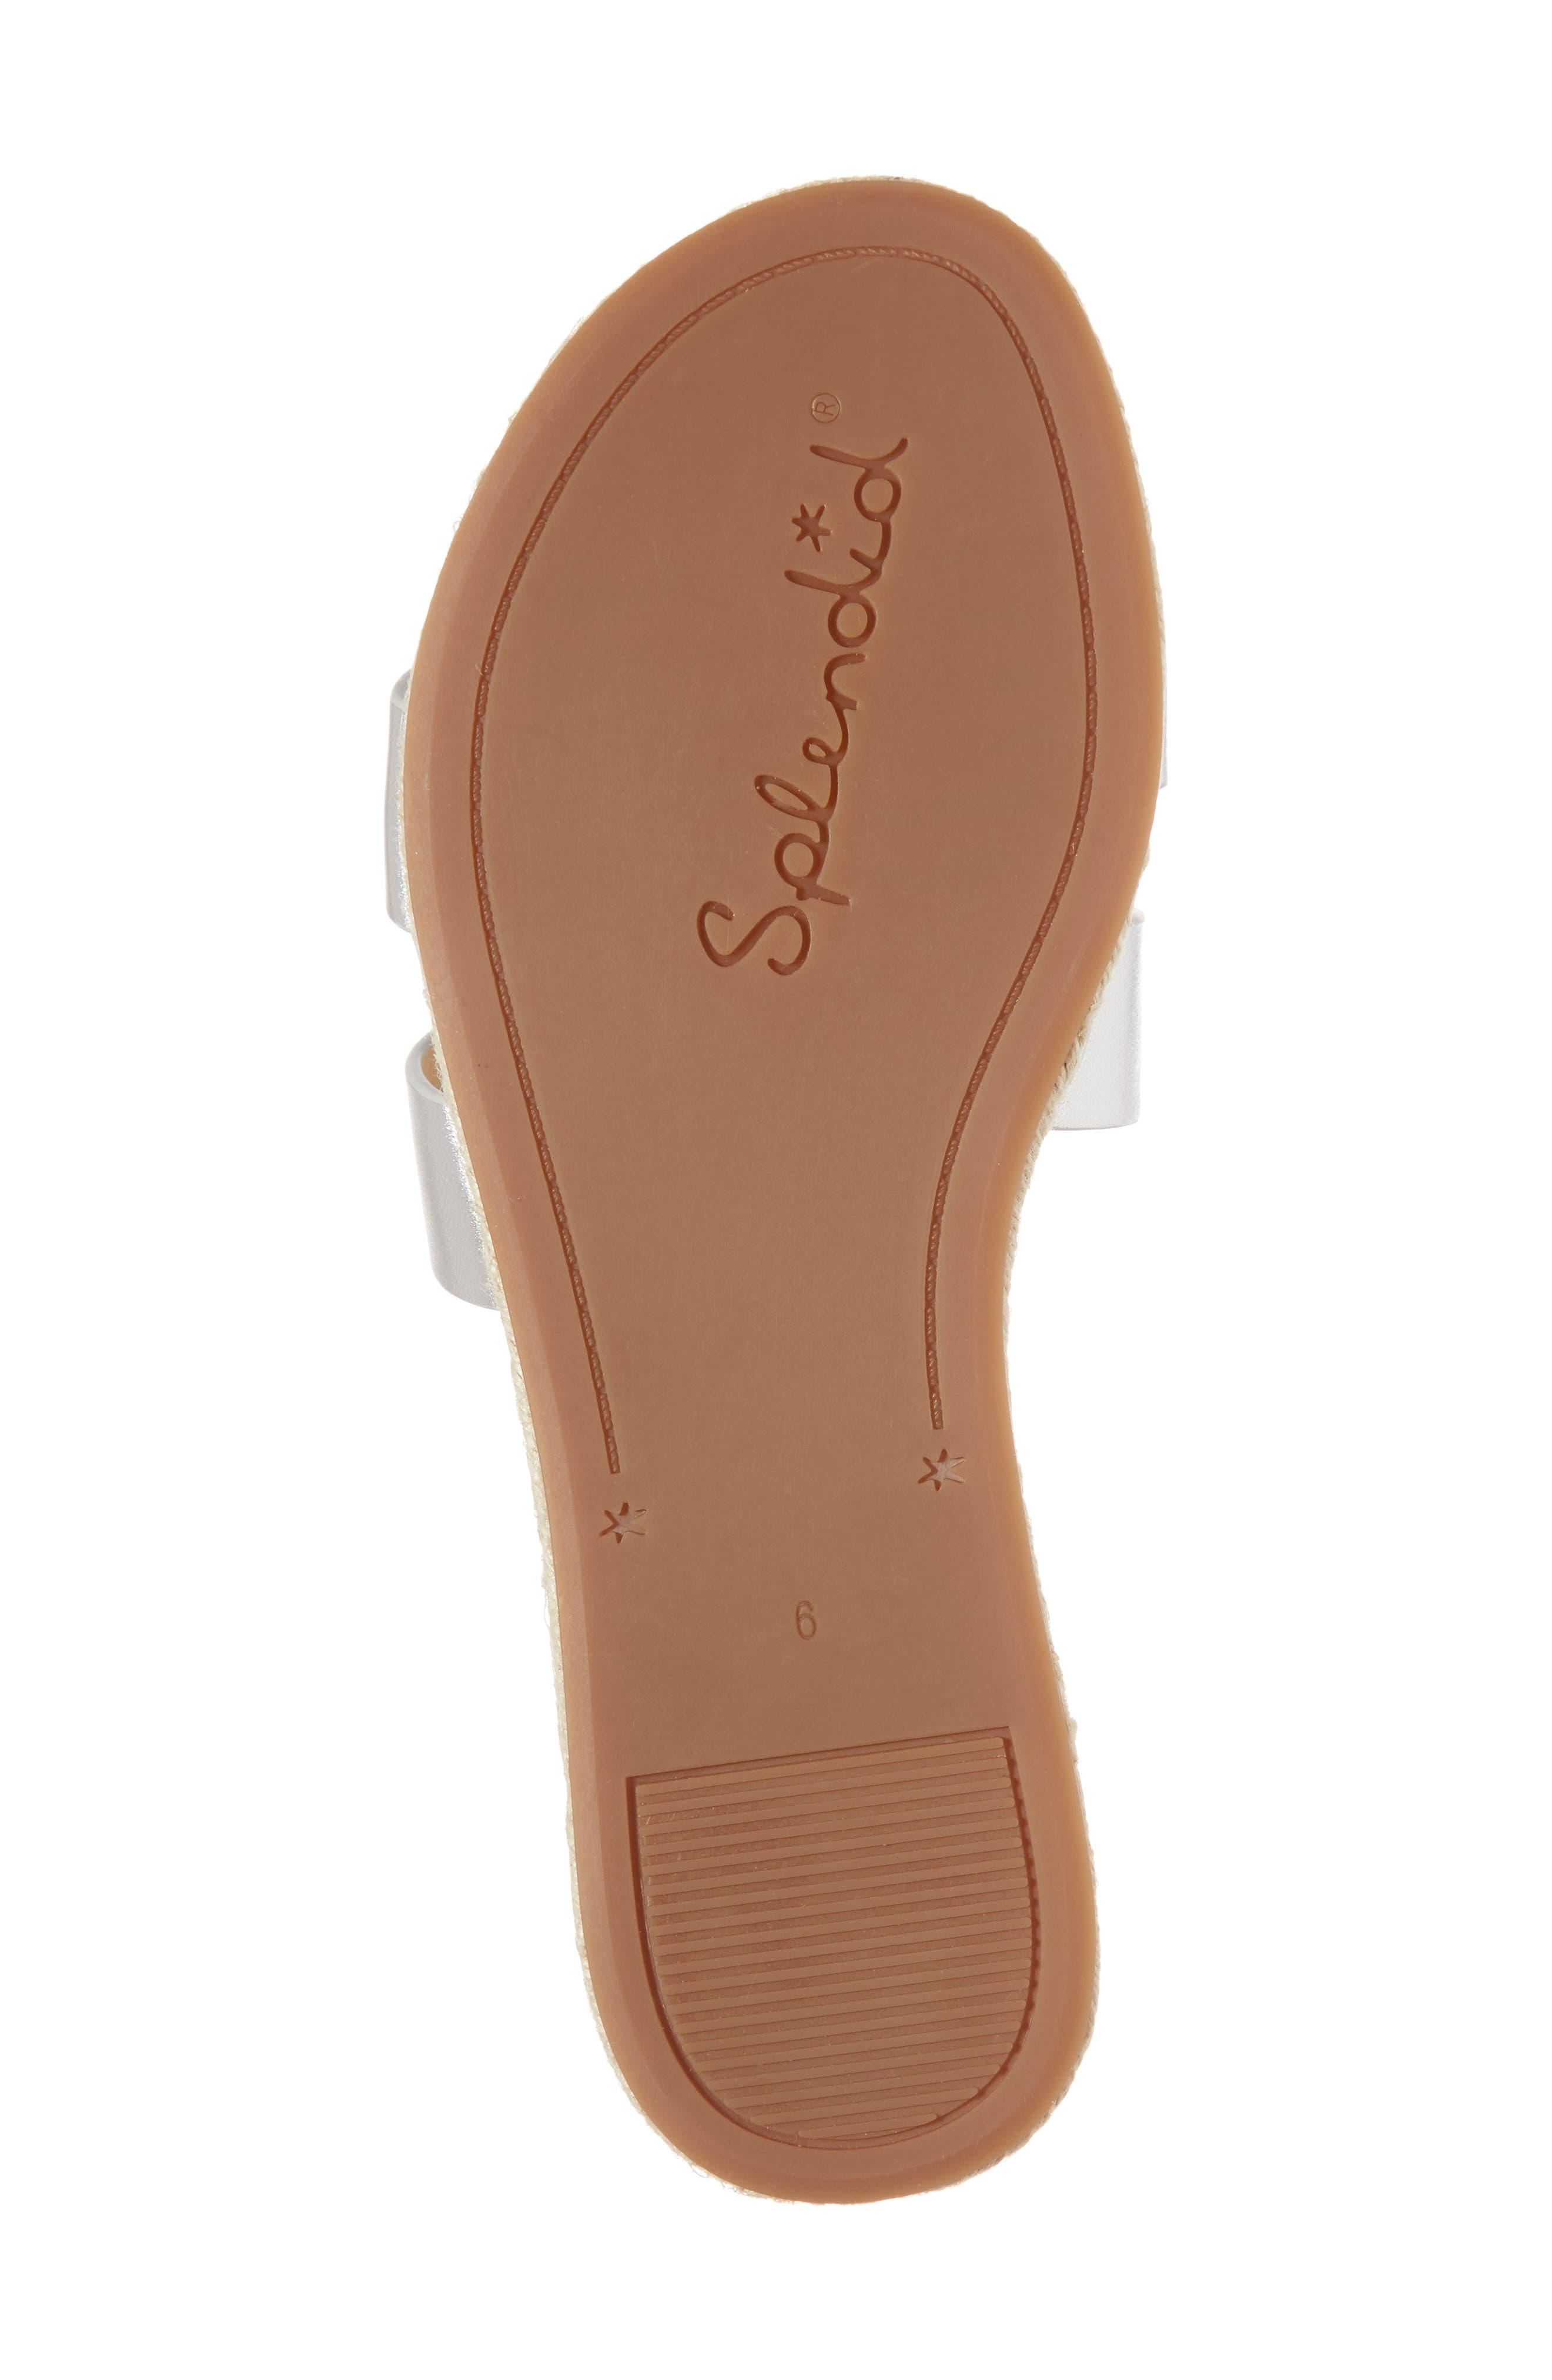 Brittani Slide Sandal,                             Alternate thumbnail 6, color,                             Silver Metallic Leather